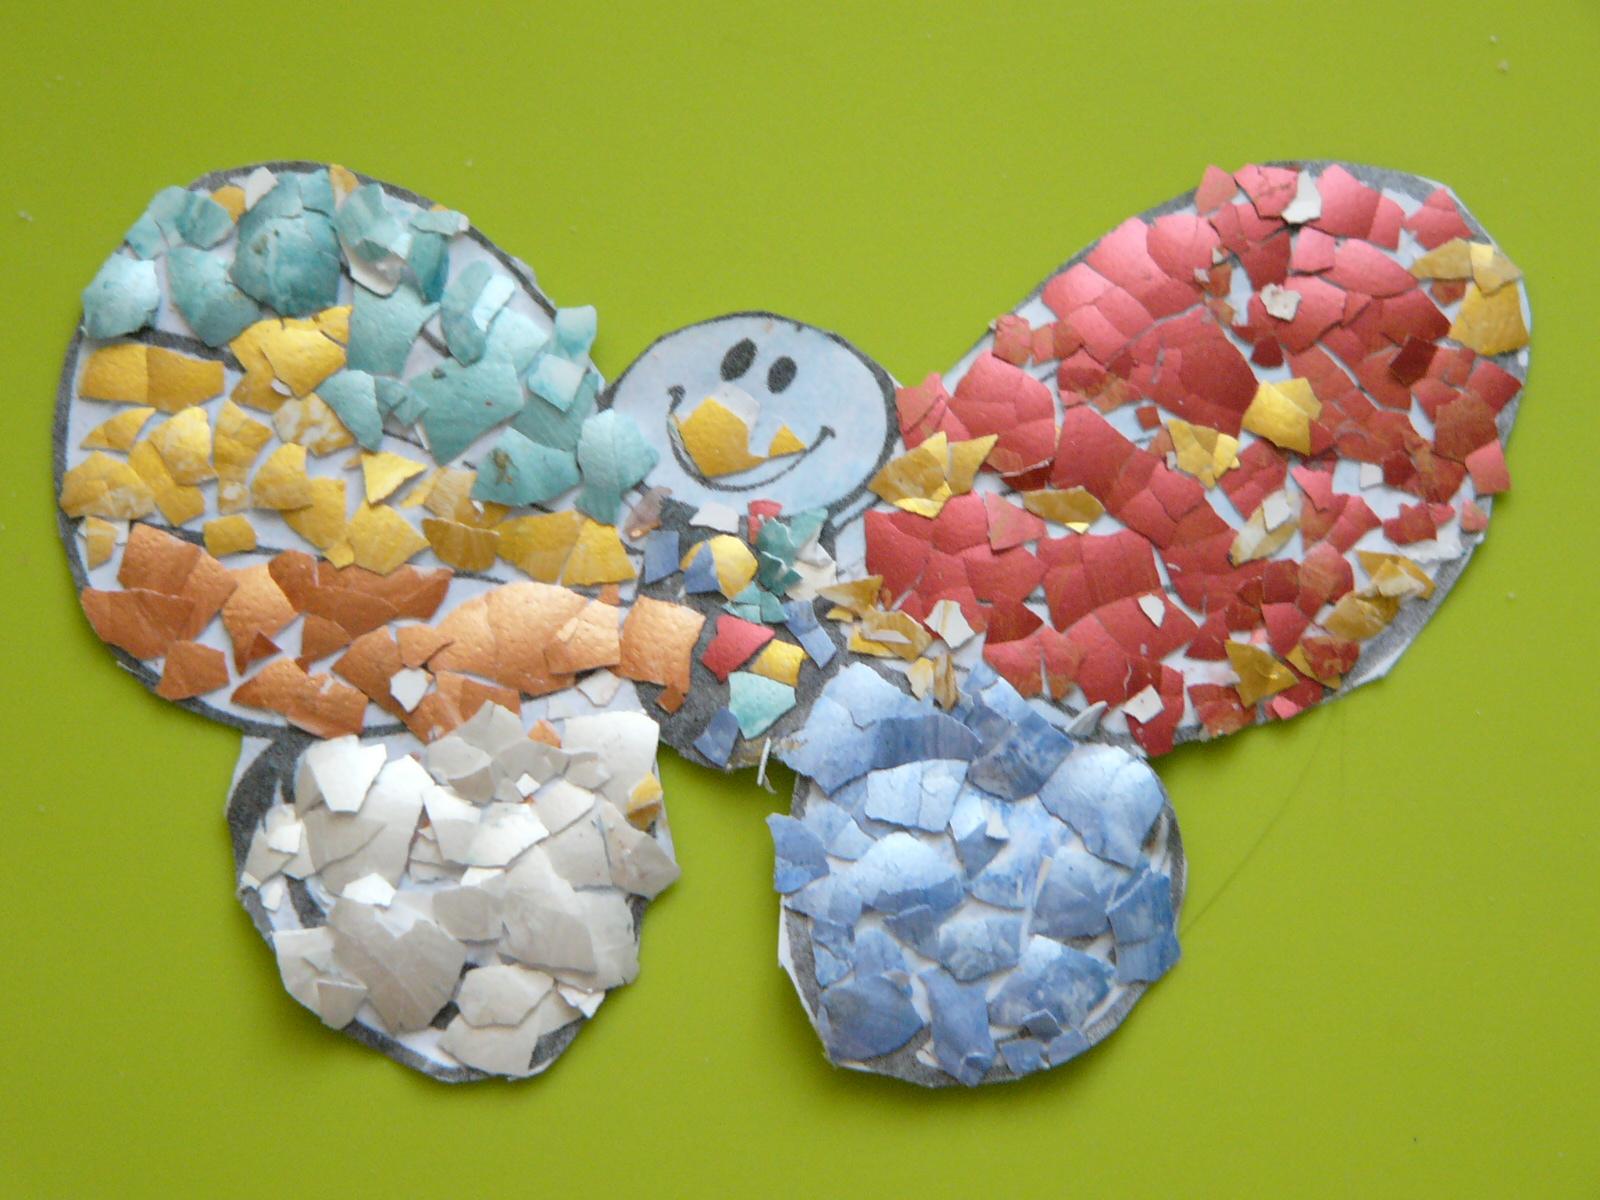 Мозаика для детей мастер-класс